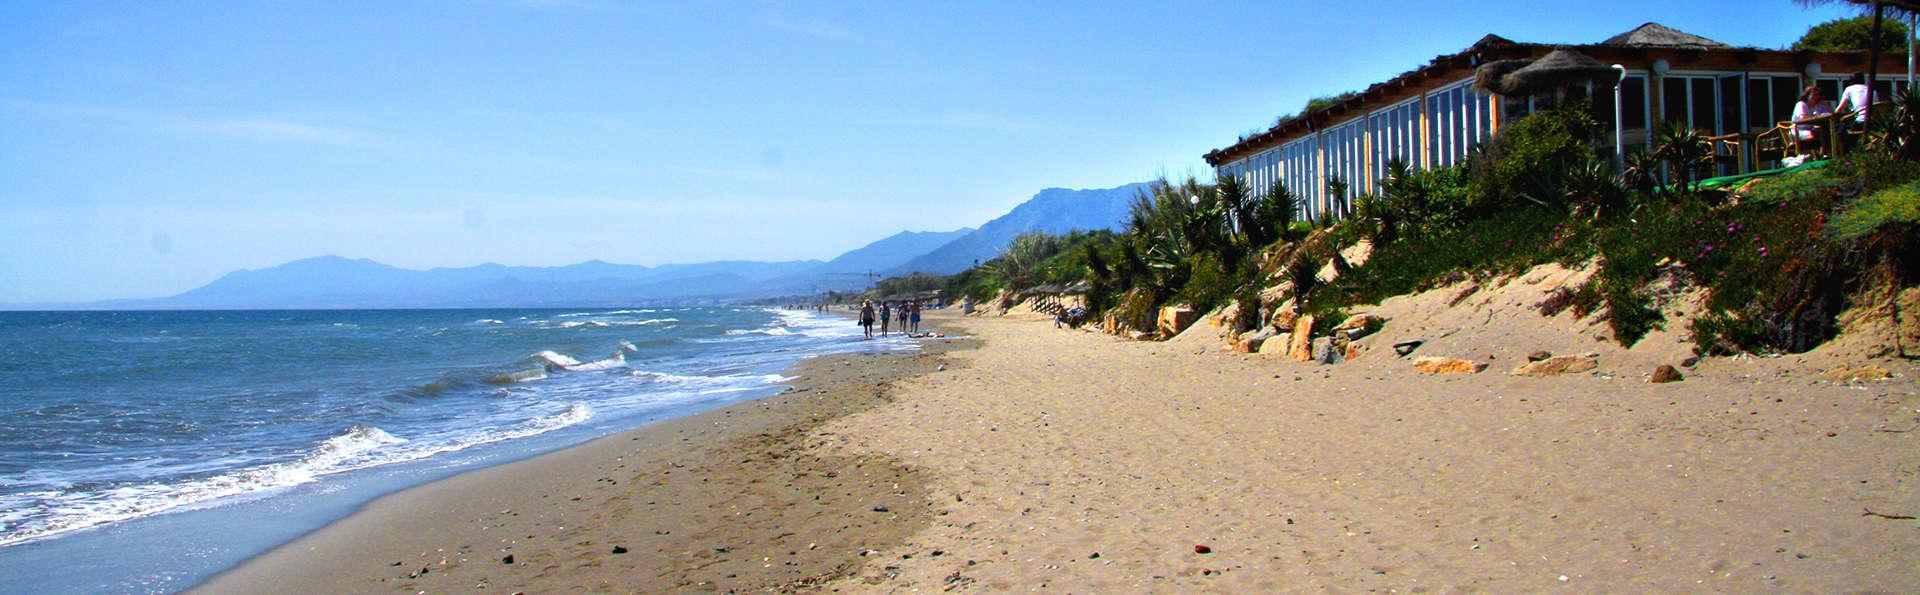 Vime La Reserva De Marbella - edit_playa4.jpg